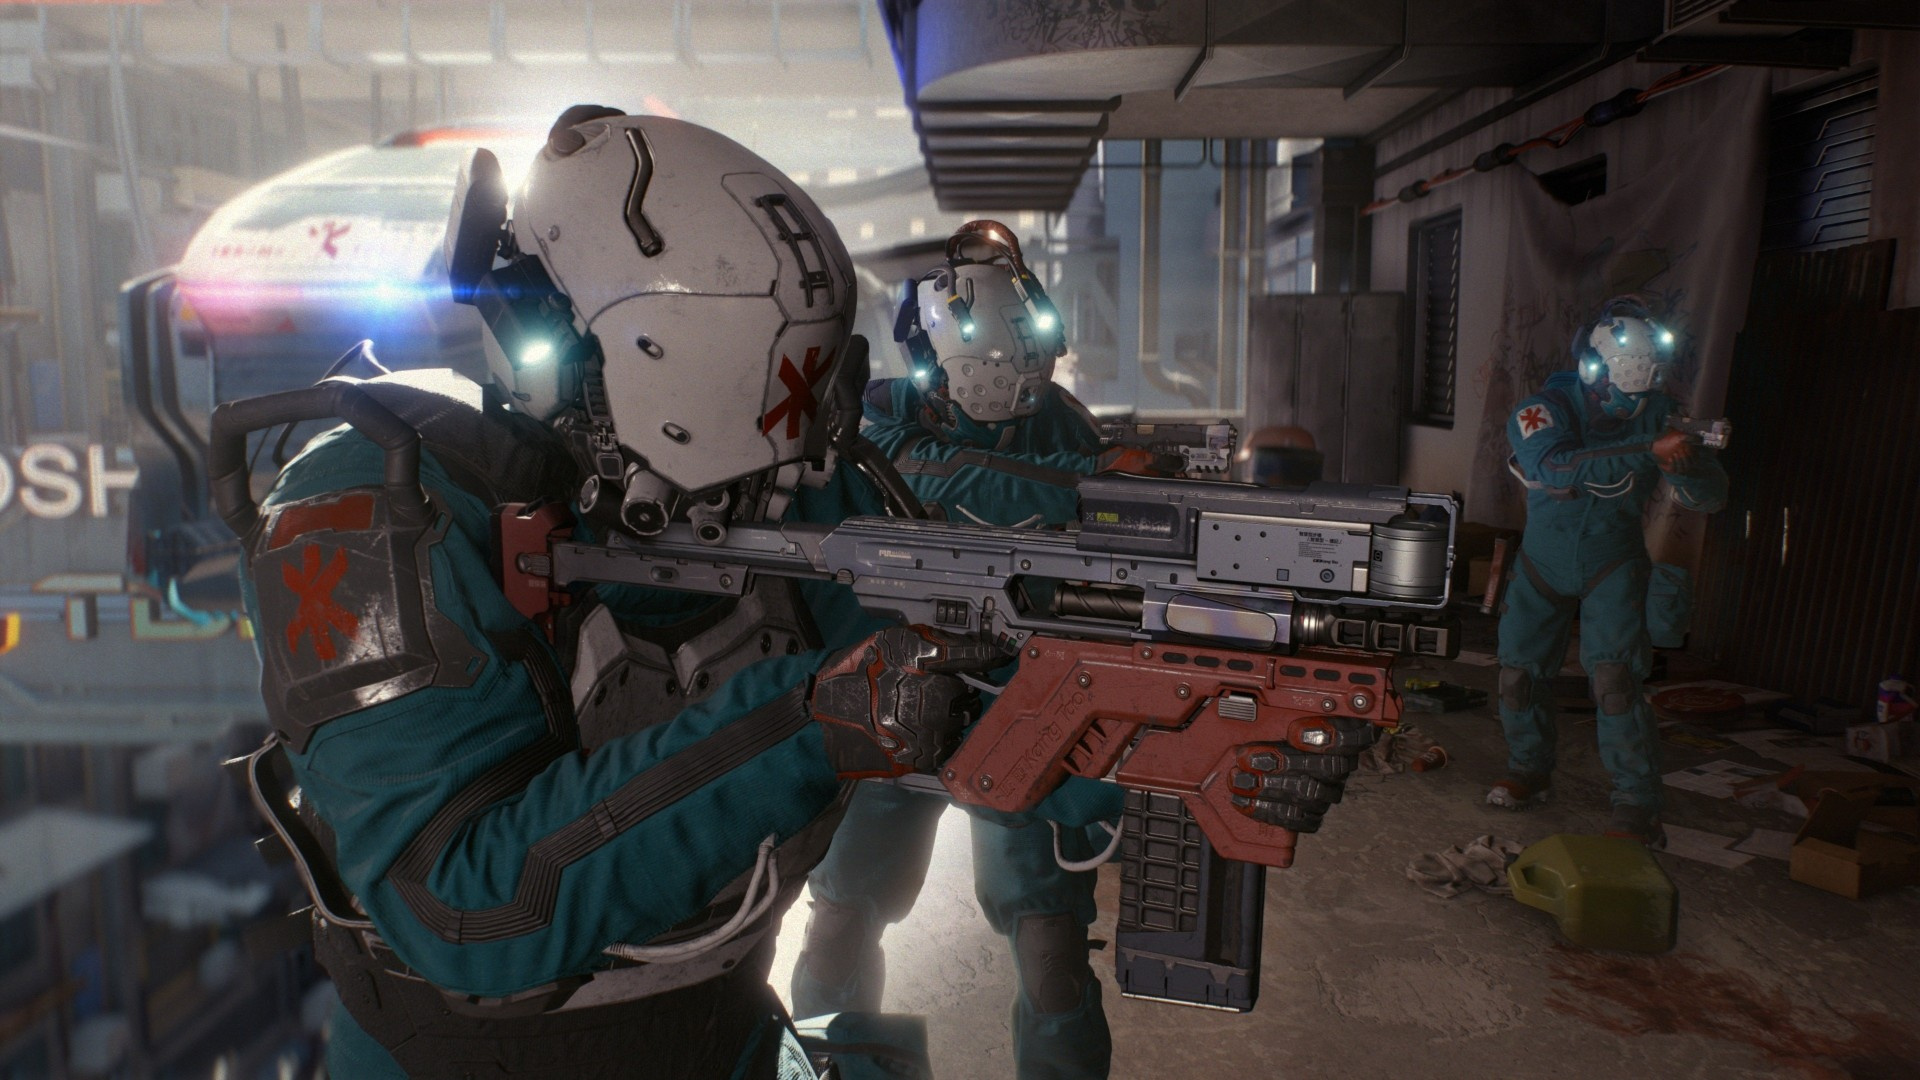 Глава CDPR прокомментировал кранчи перед релизом Cyberpunk 2077